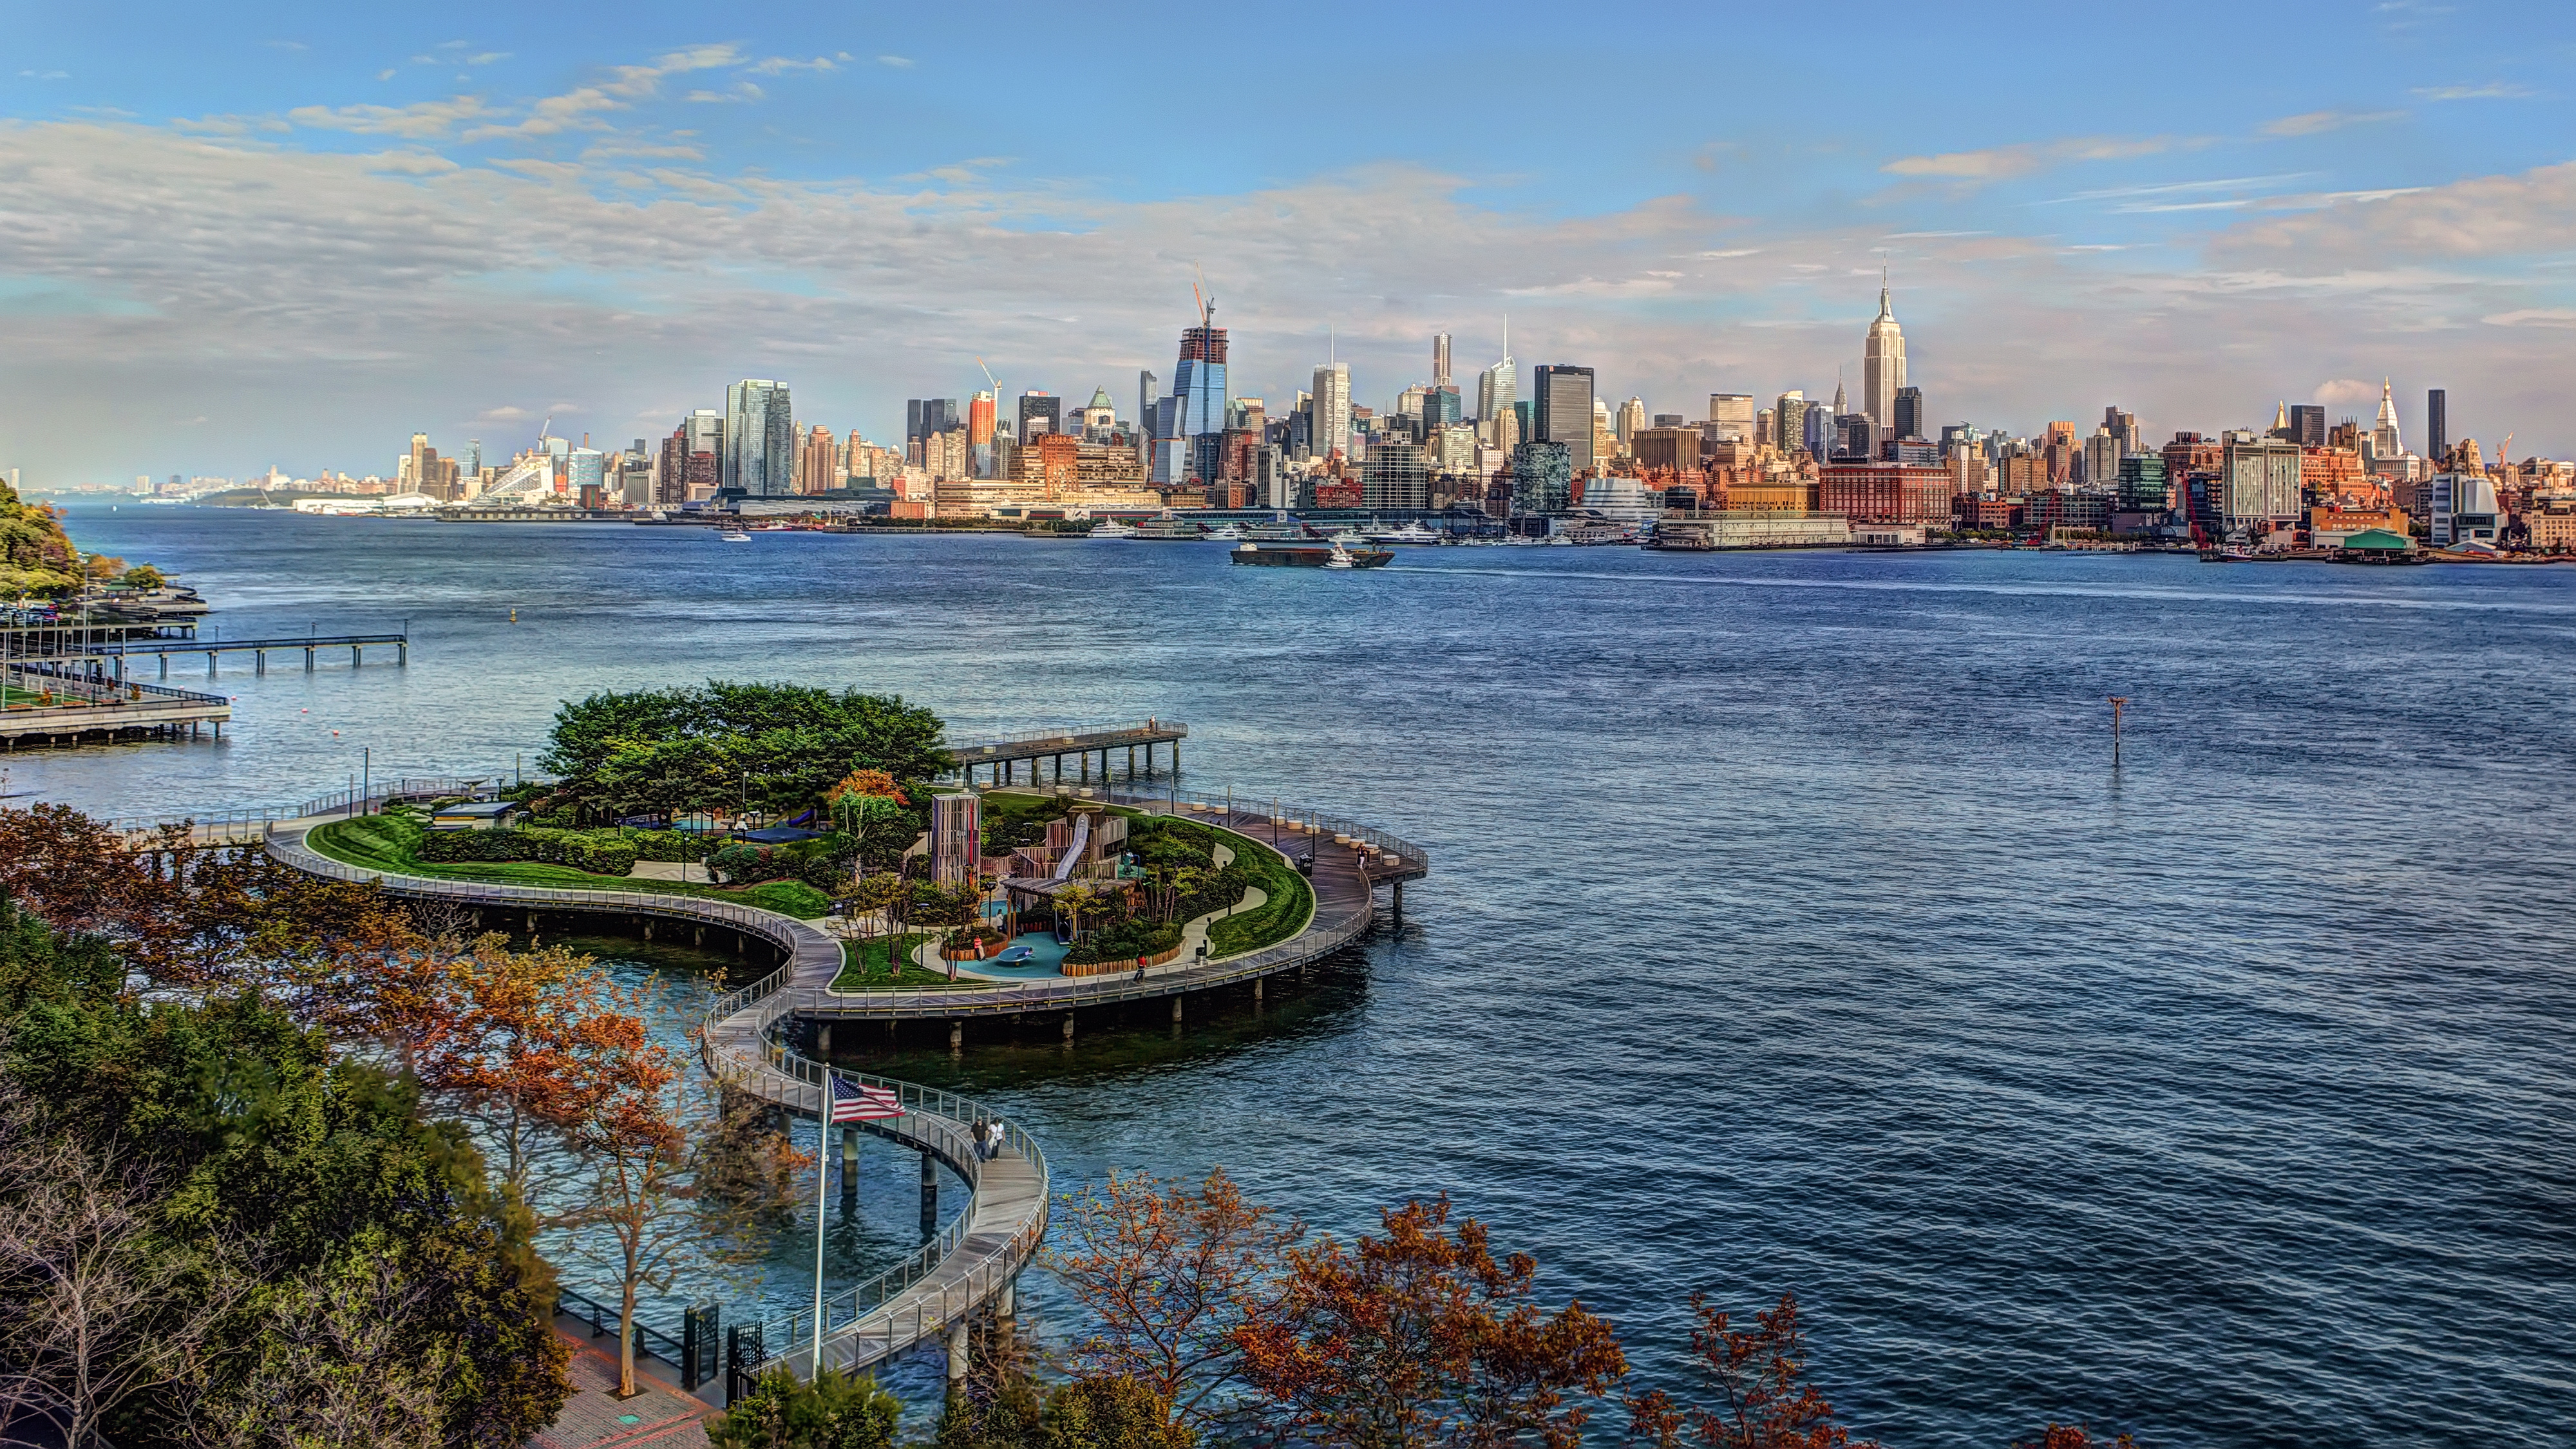 NYC20153Q3A0001